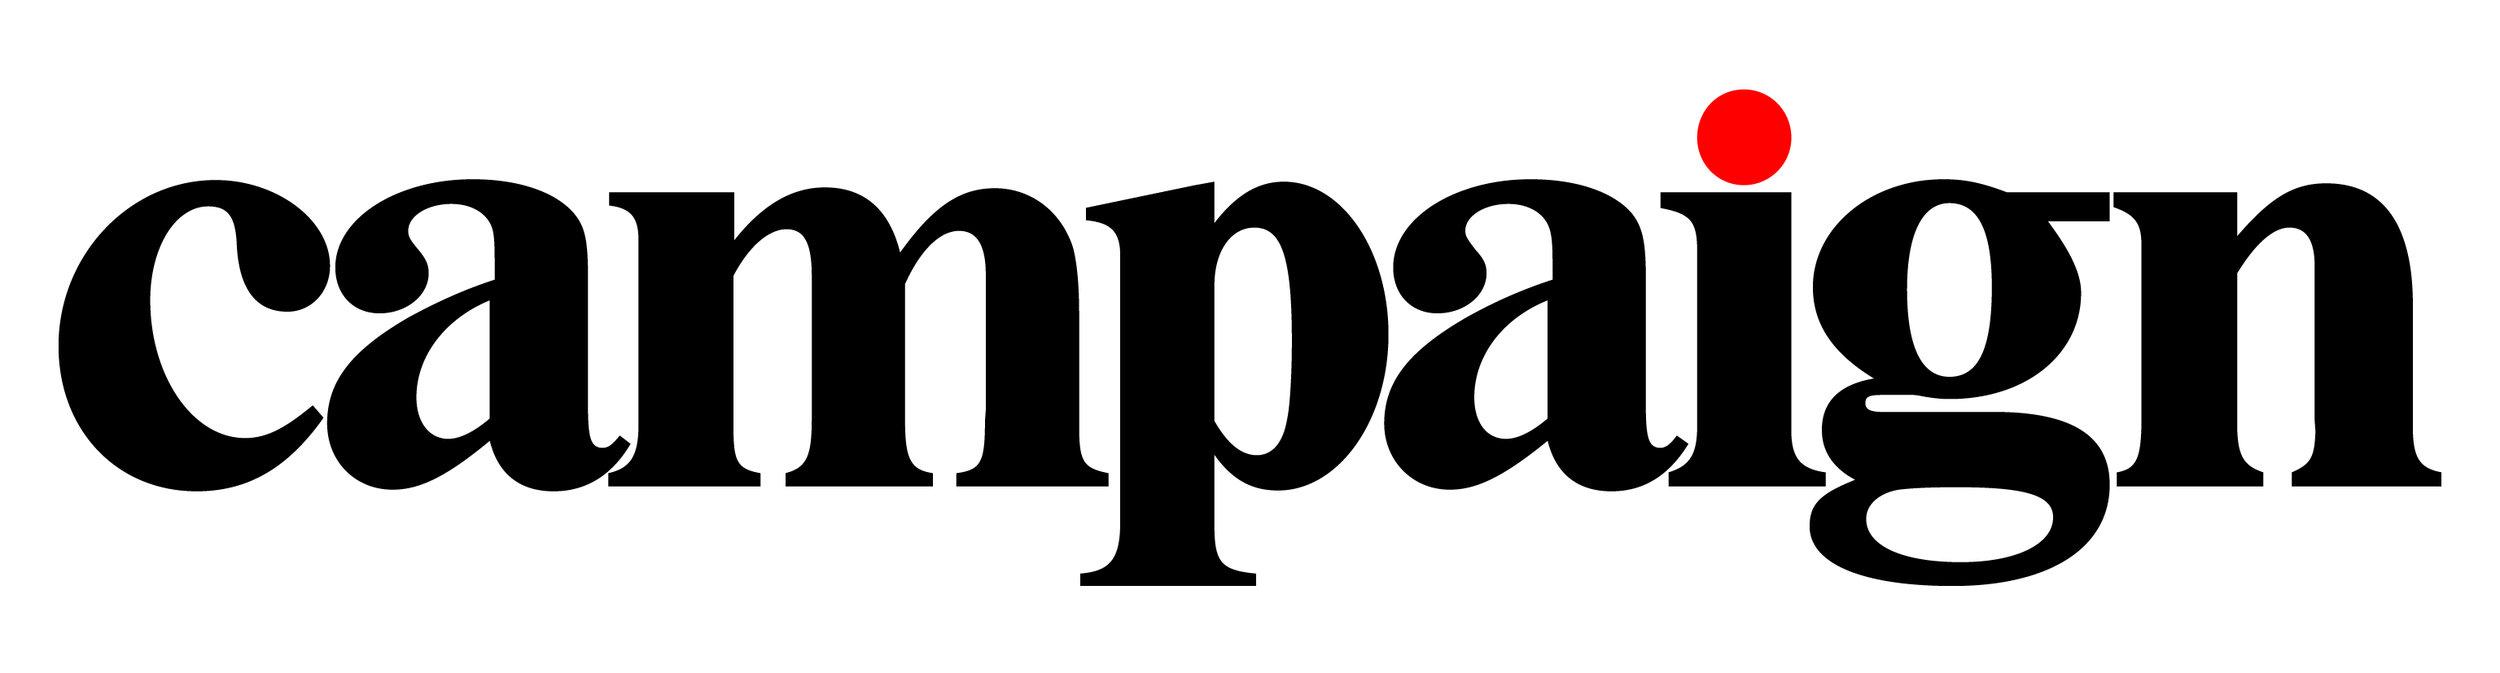 campaign-logo-1.jpg